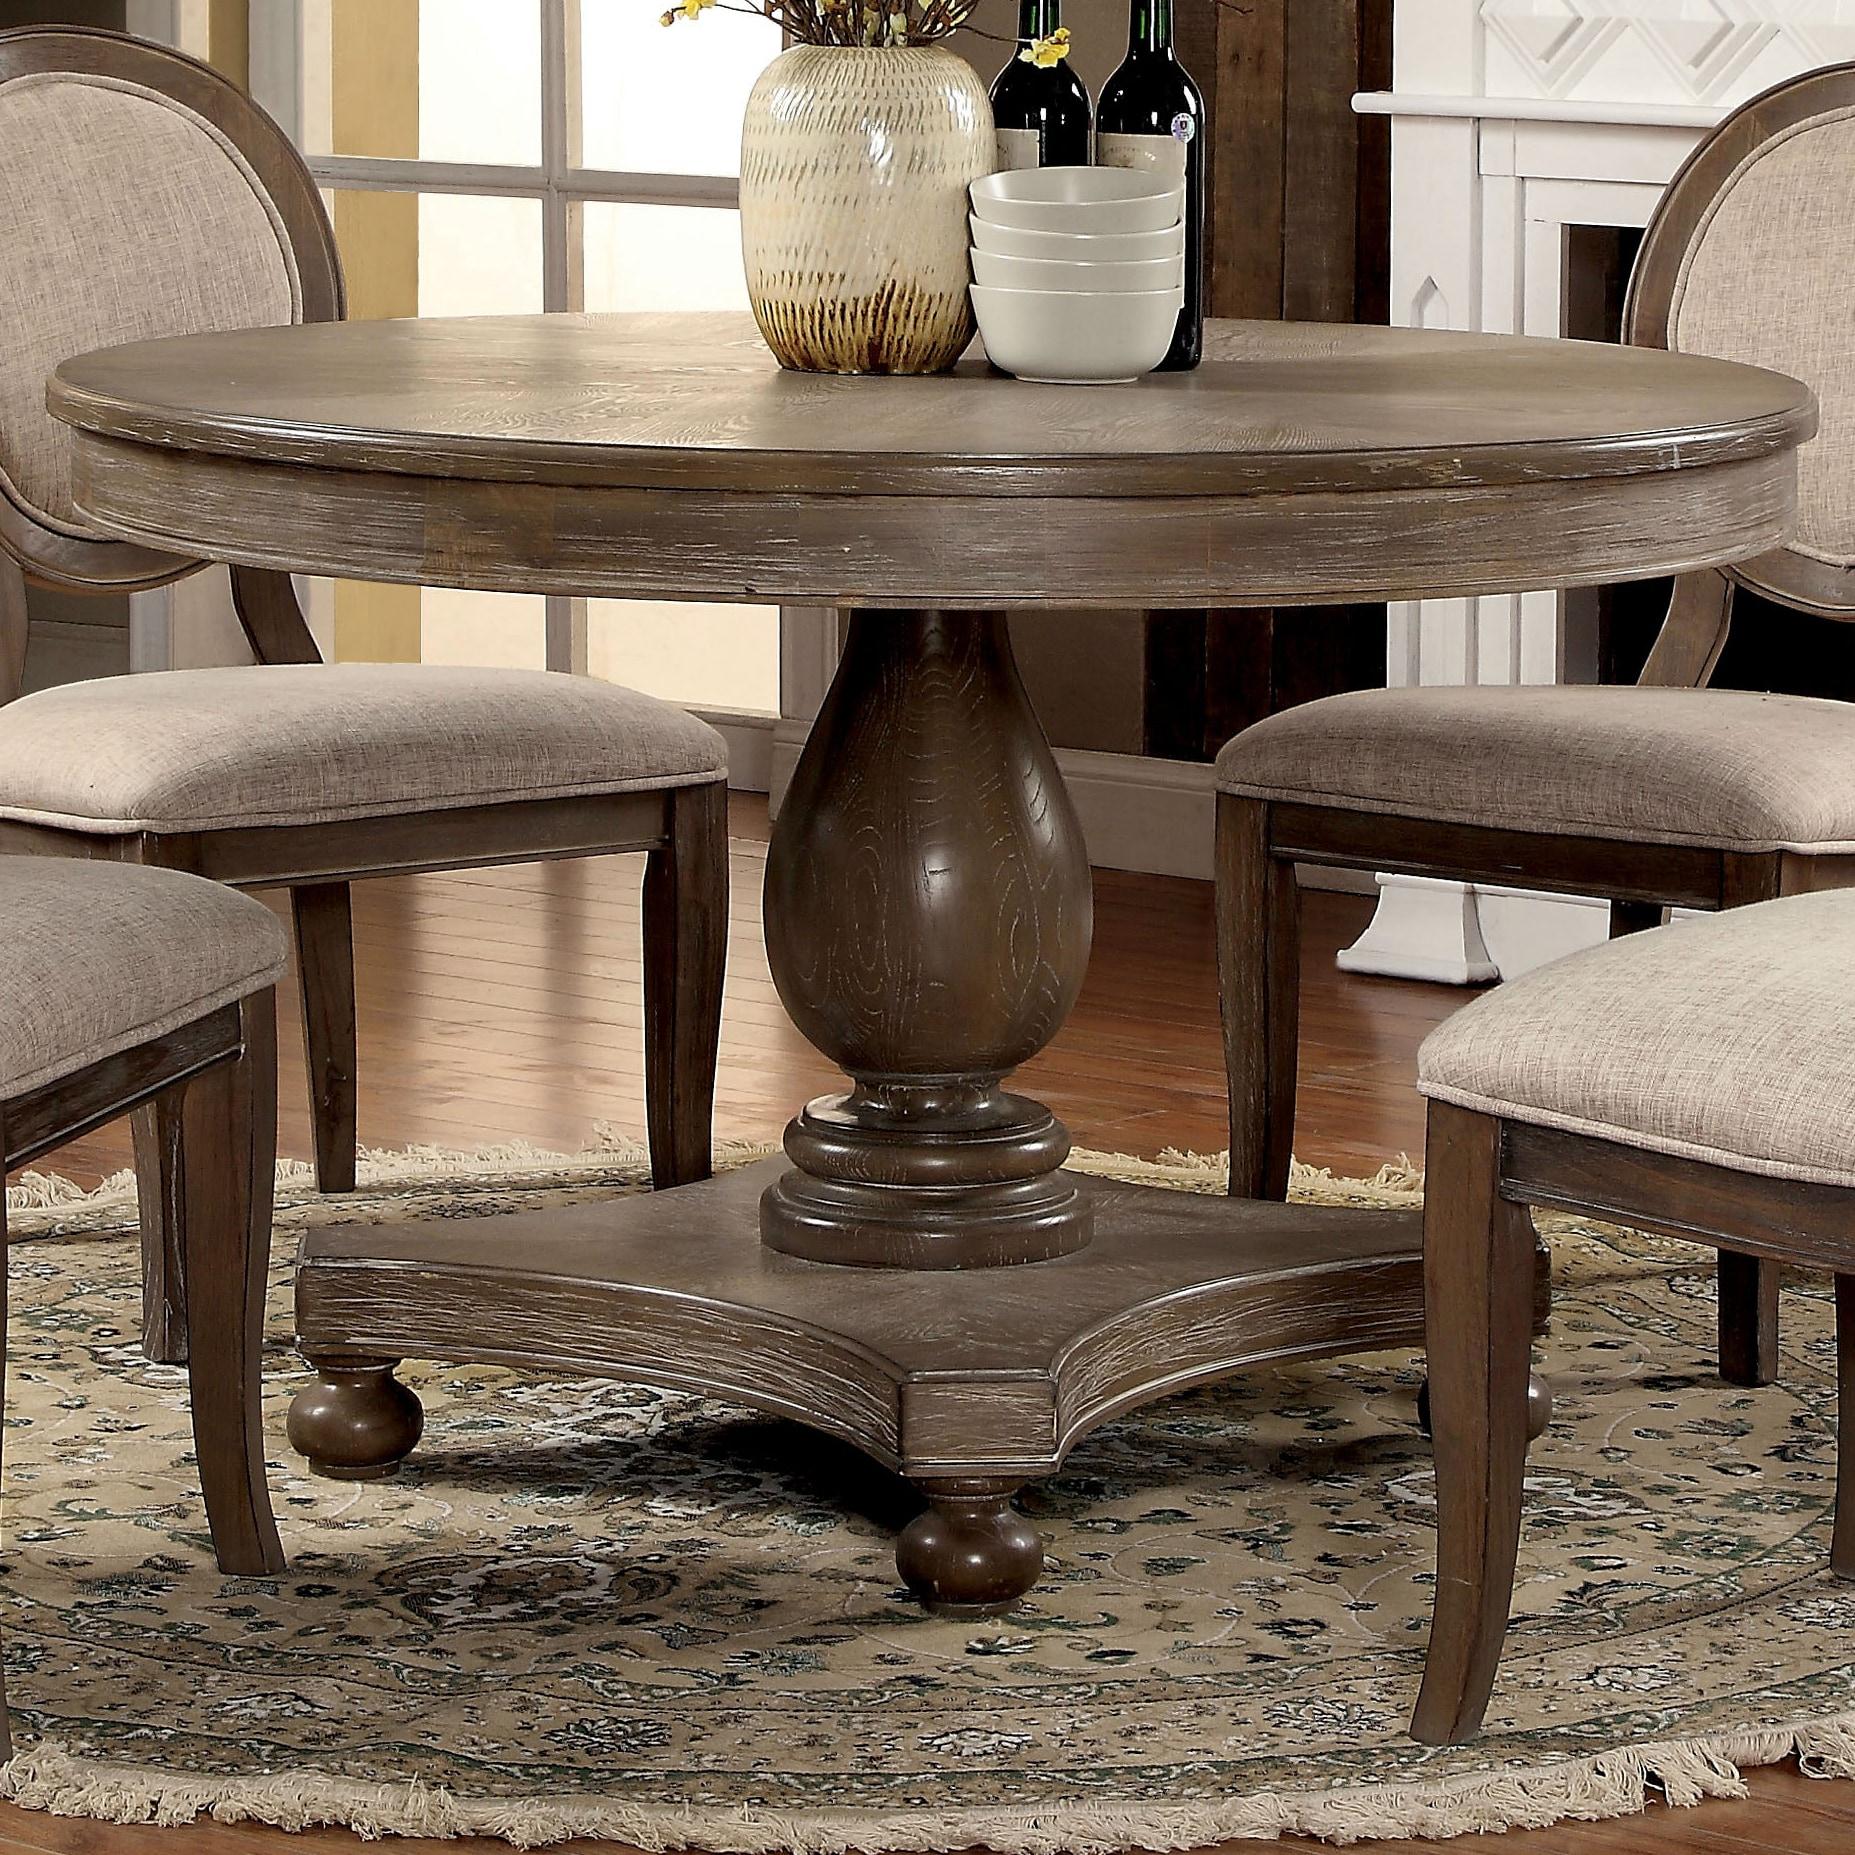 Lelan rustic 48 inch dining table by foa